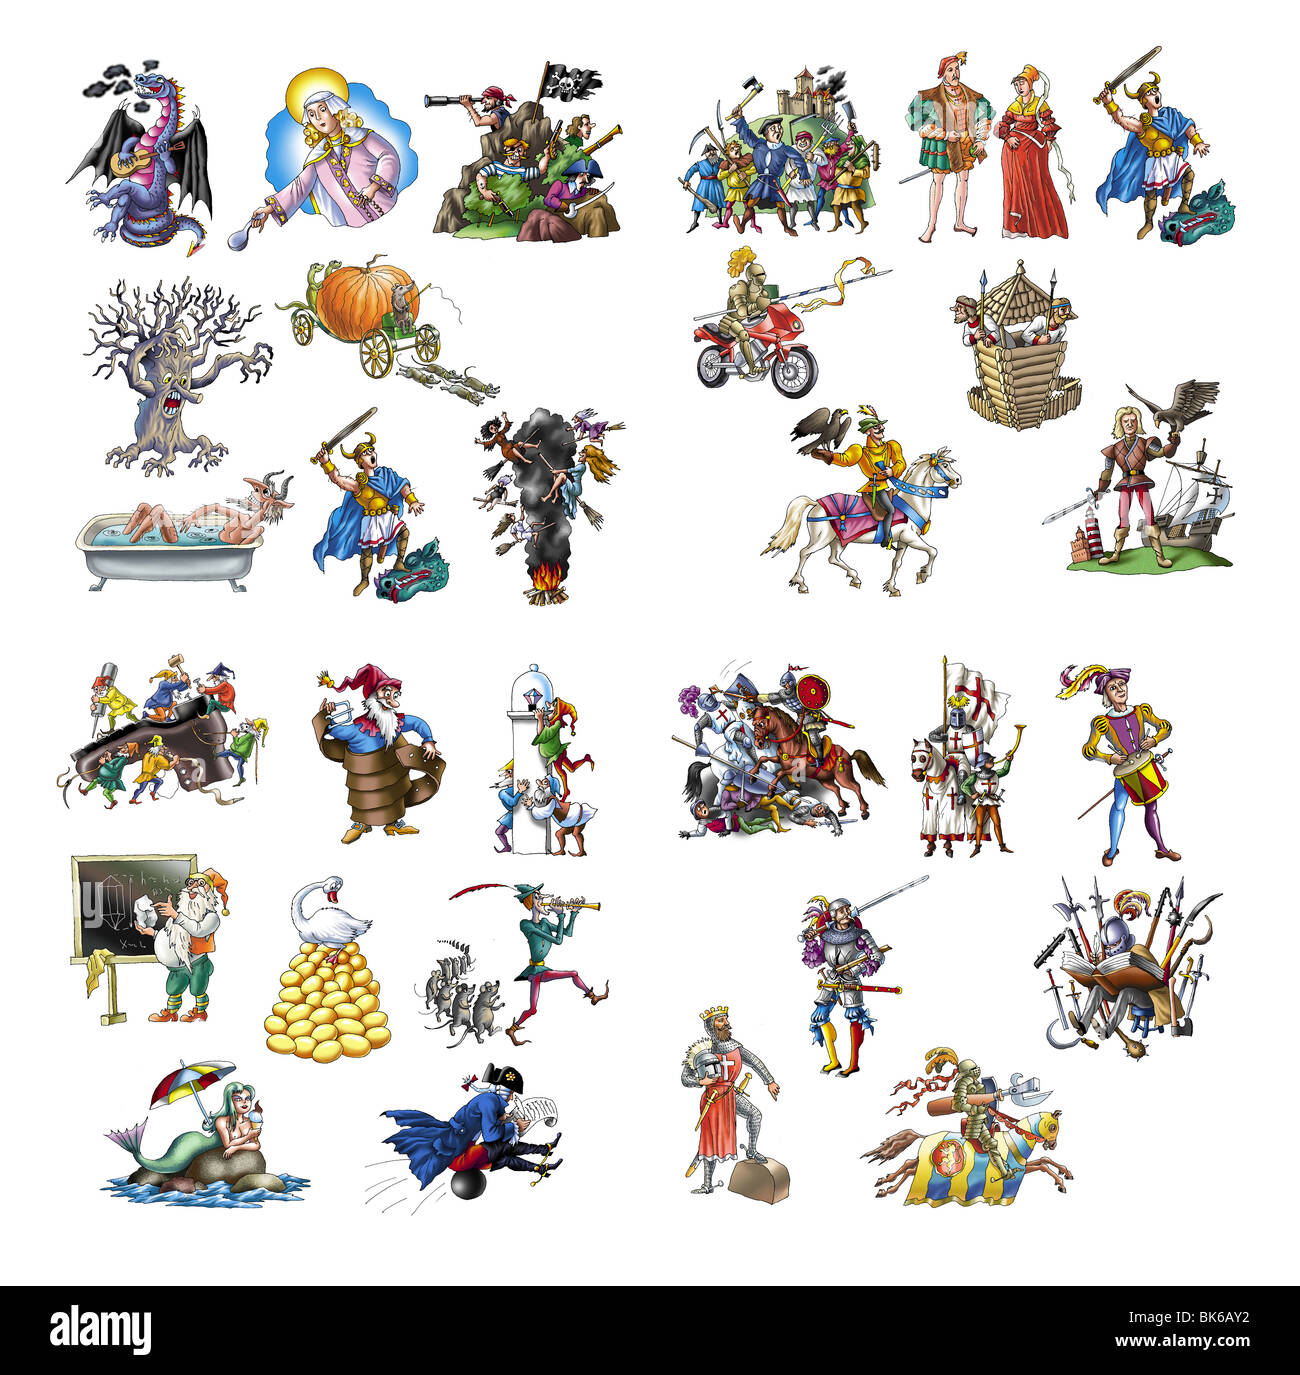 Legenden und Märchen tales_2 Stockbild